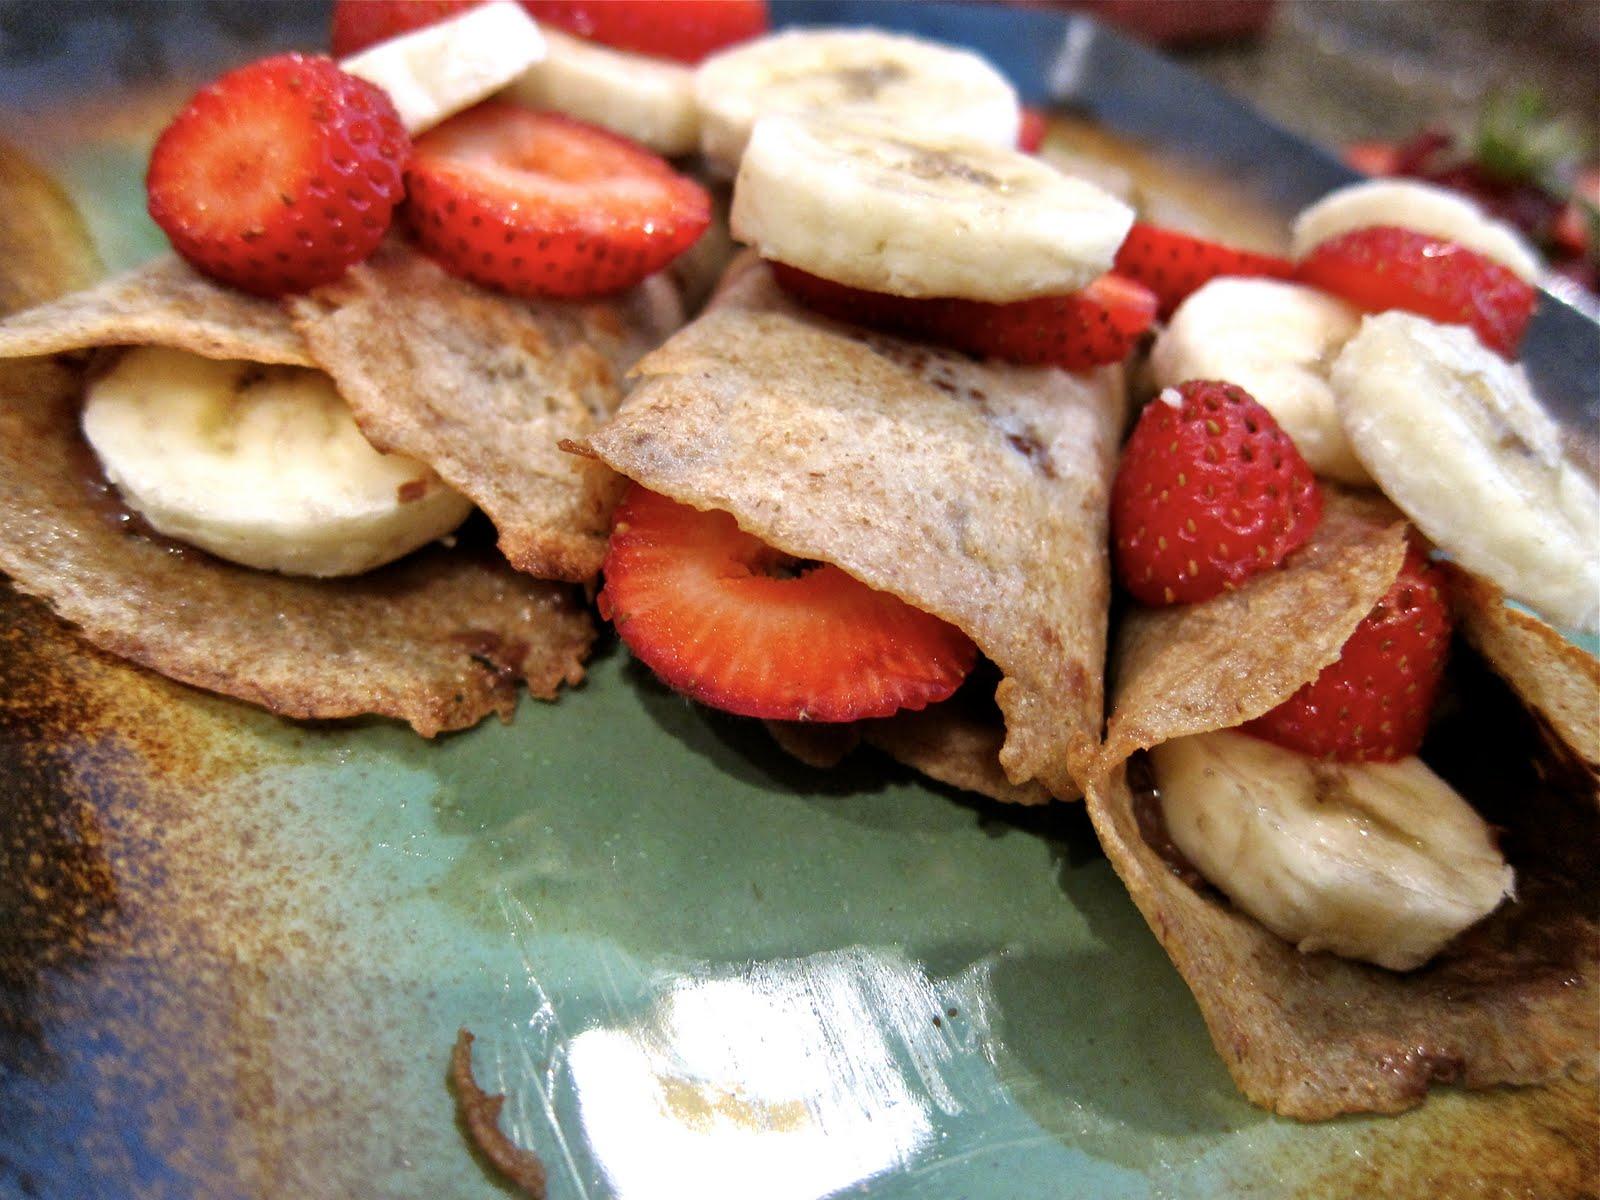 Saleena: Strawberry & Banana Nutella Crepes